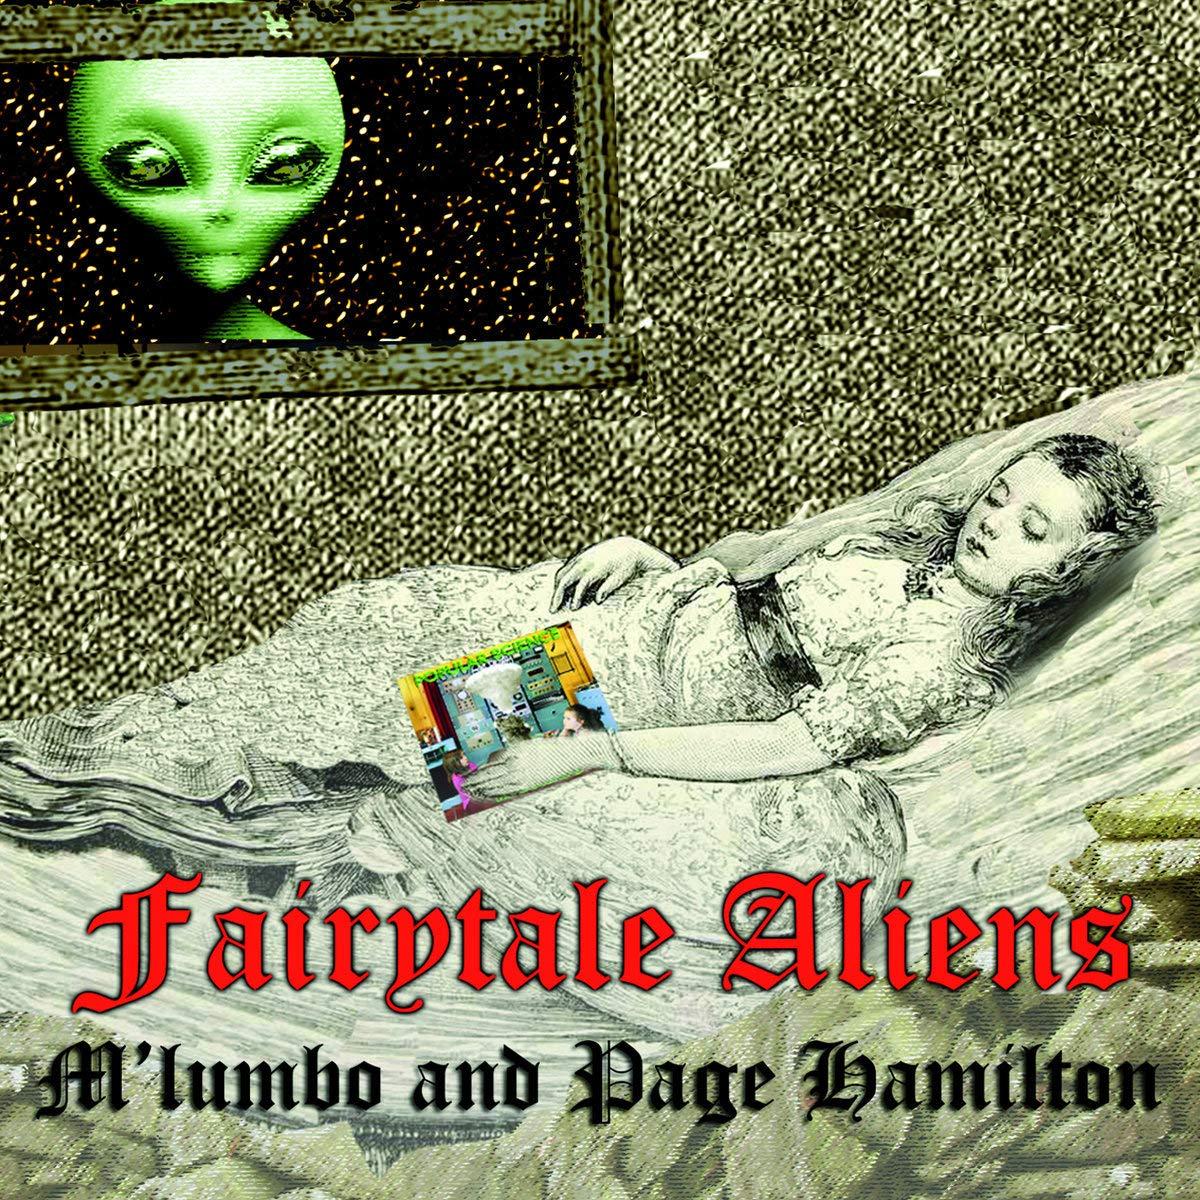 M'Lumbo: Fairytale Aliens